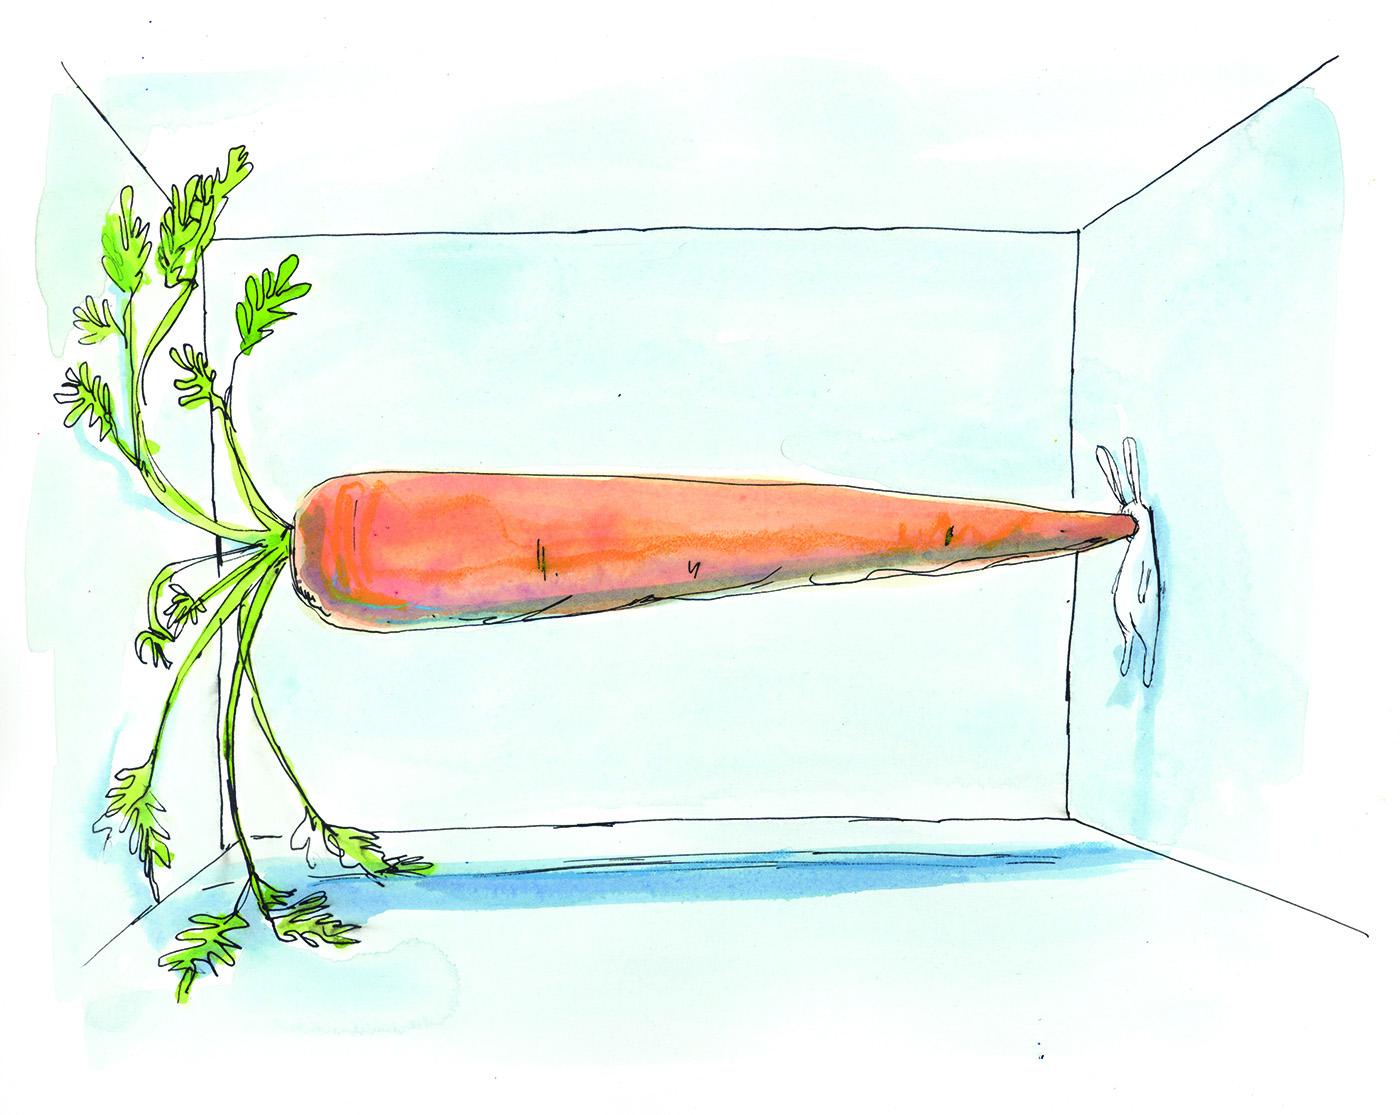 AI 32 2013 - ARTIST: Graham RoumieuTITLE: Carrot